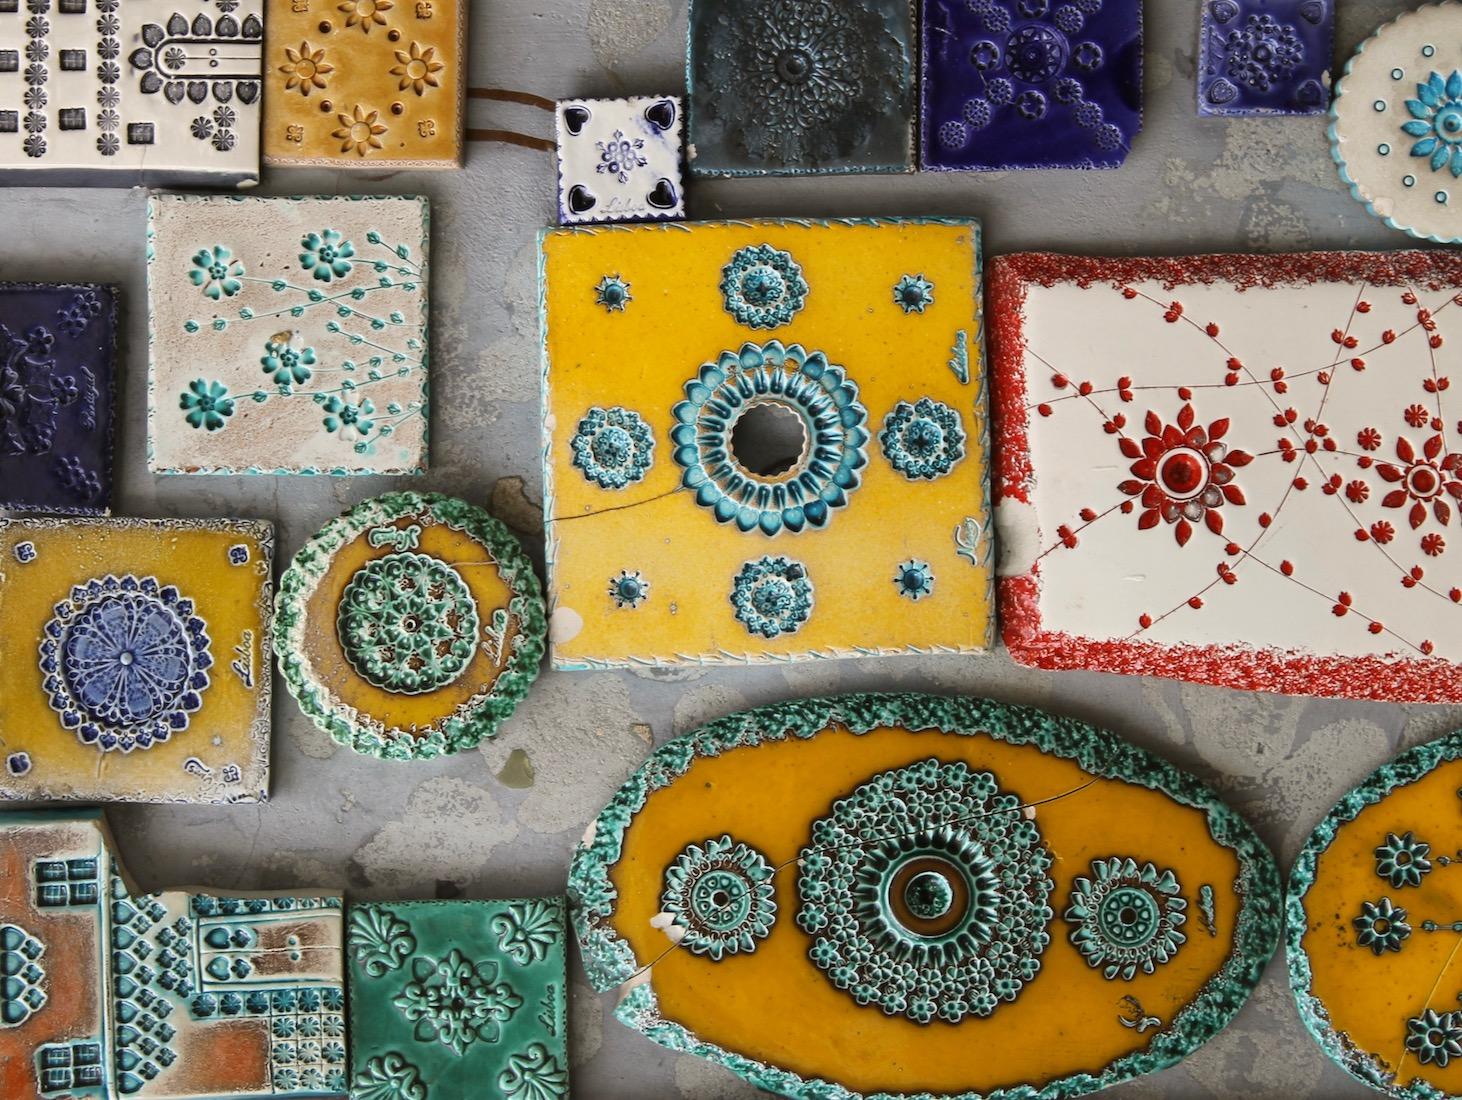 azulejos-lisbonne-2